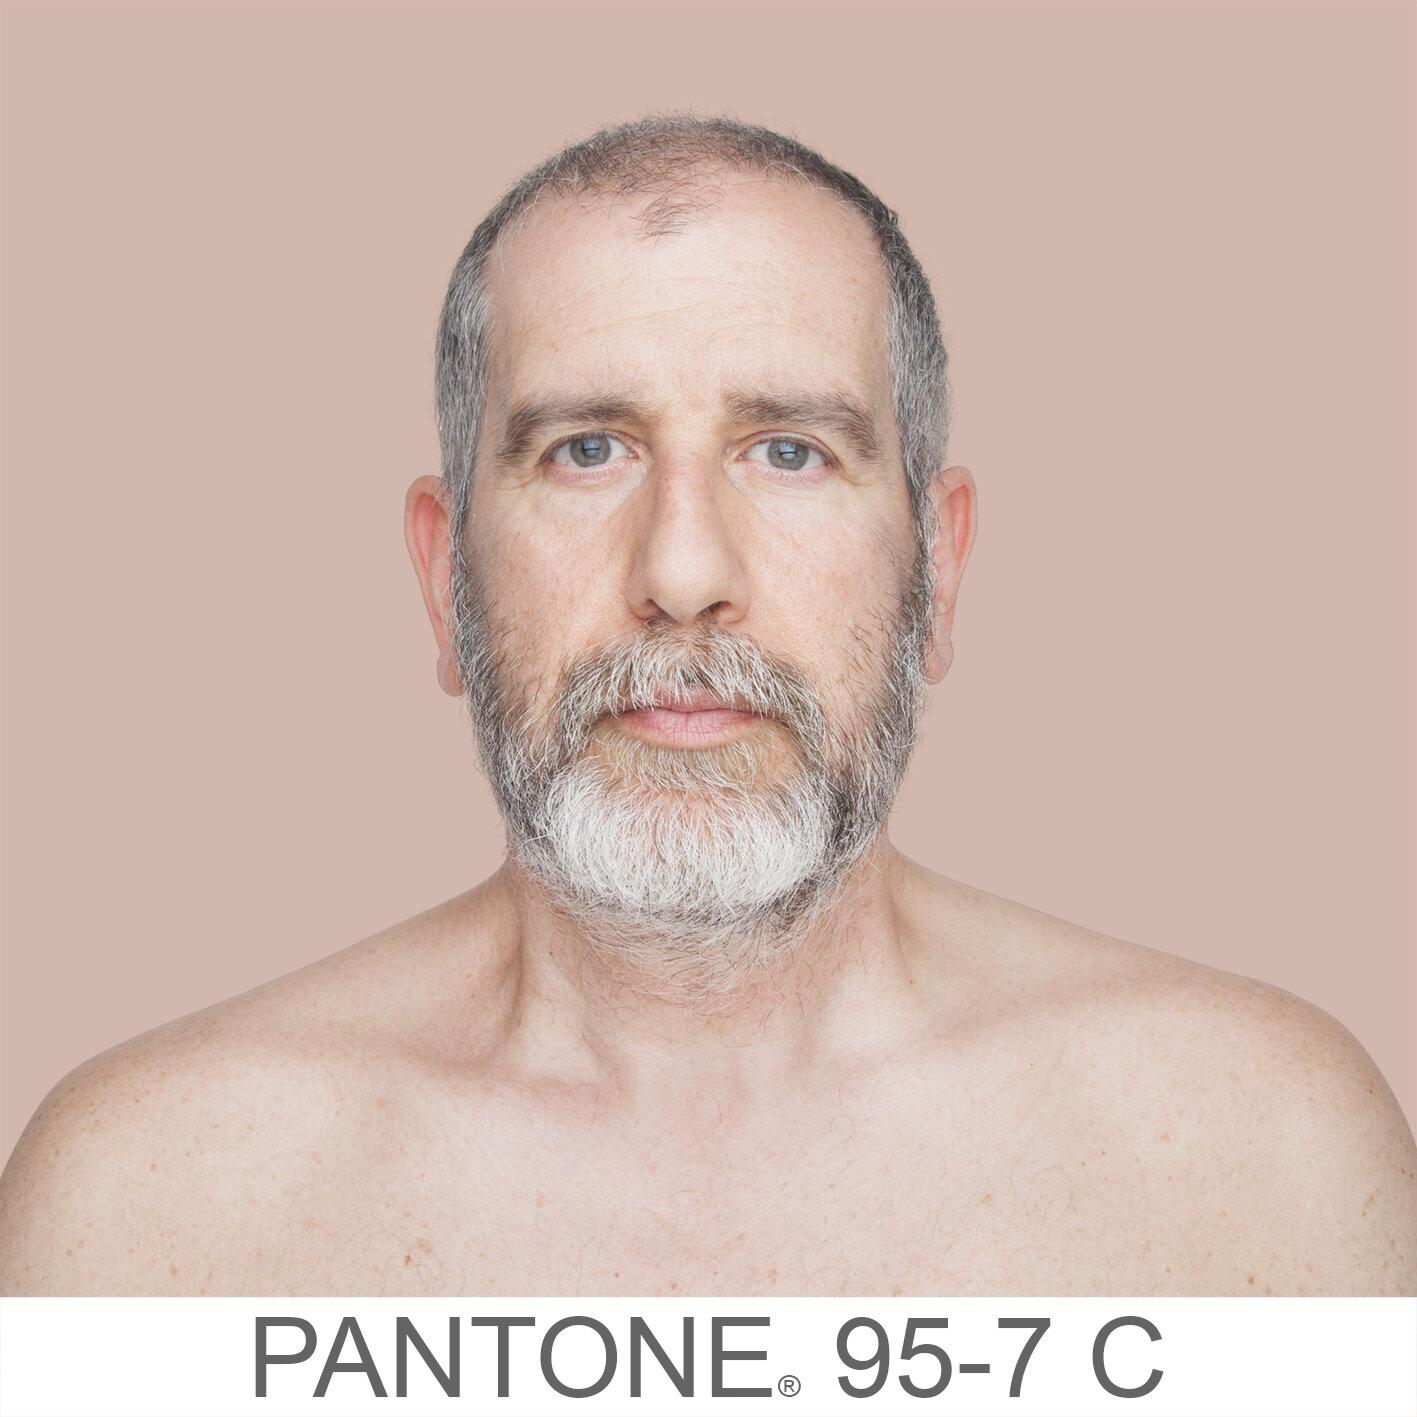 Humanae 95-7 C1 atx copia.jpg